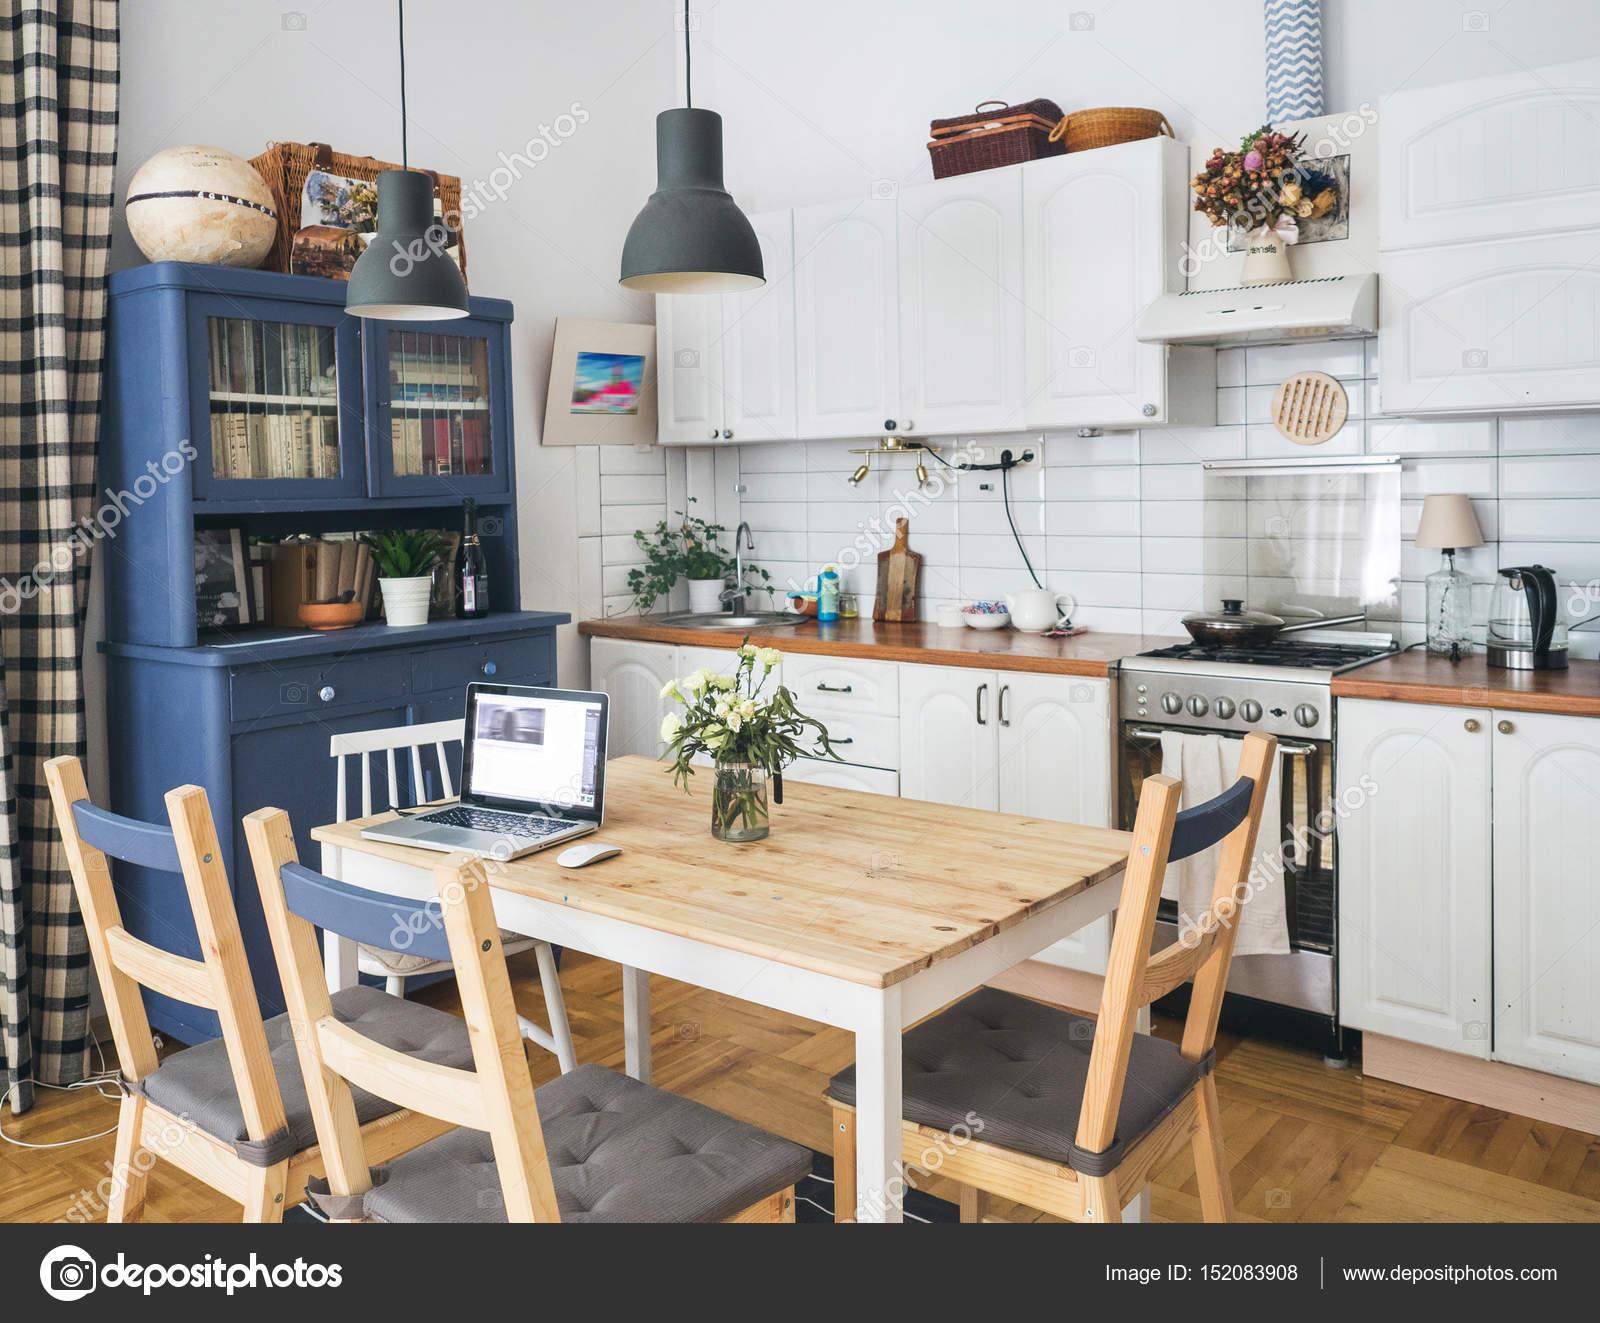 Interieur D Une Cuisine Scandinave Photographie Svmelnikoff